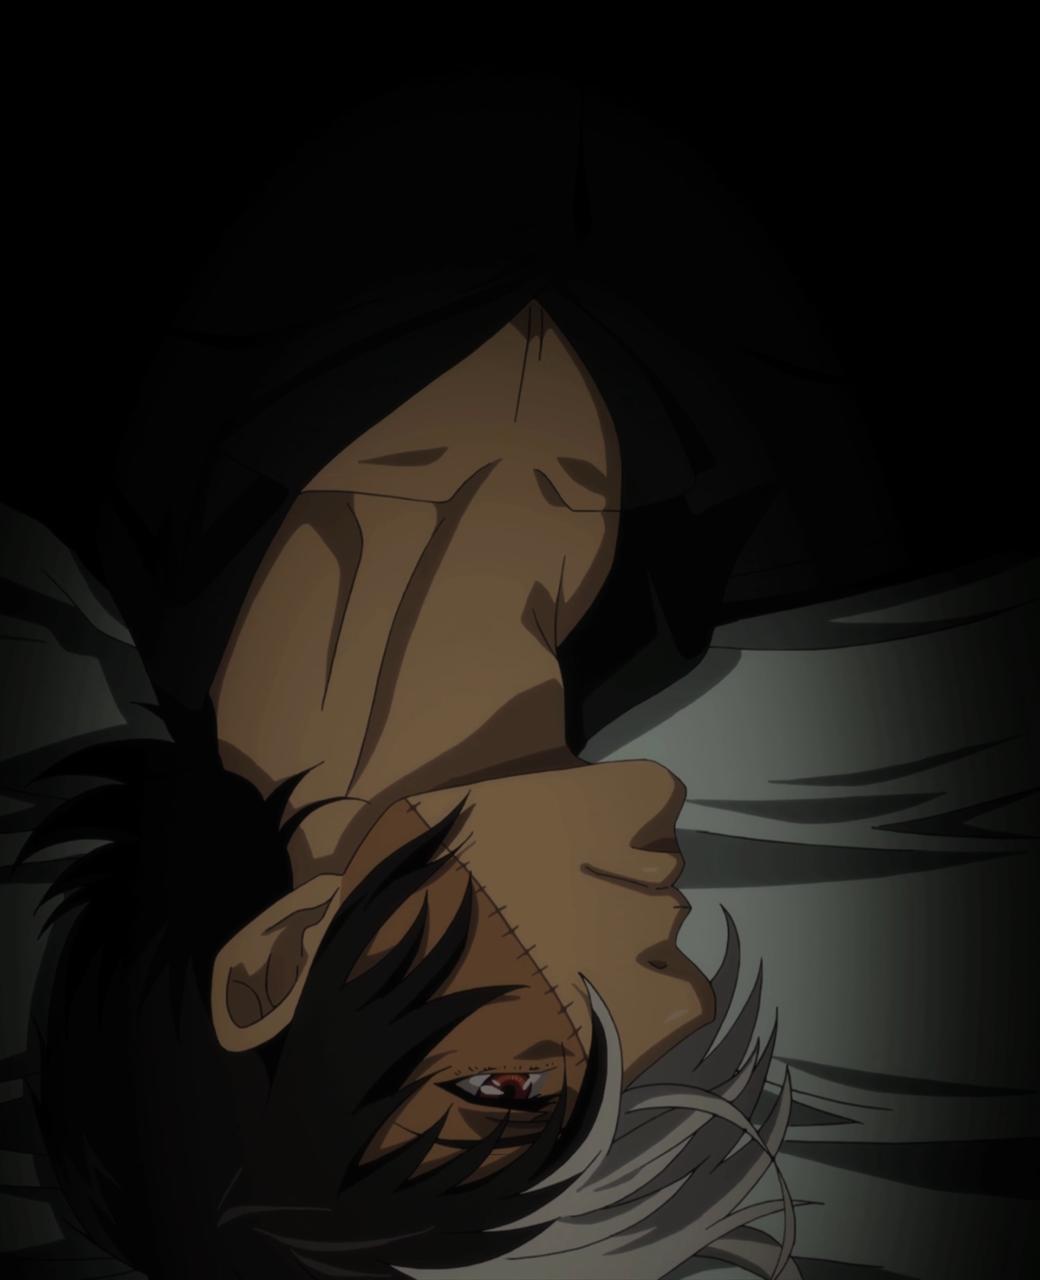 Ahem Black Jack Anime Jack Black Young Black